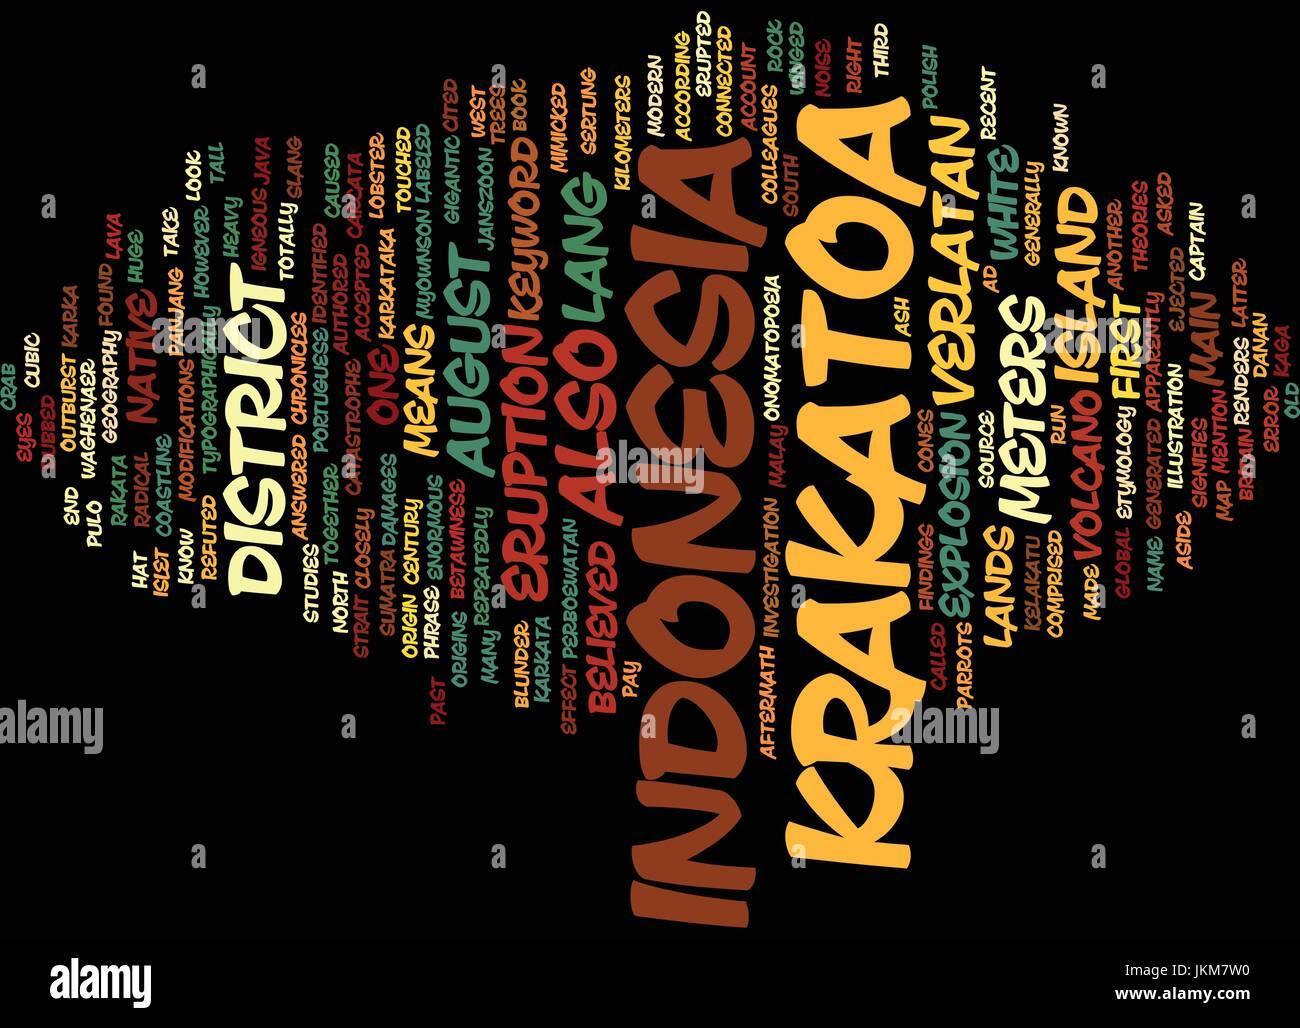 KRAKATOA INDONESIA Text Background Word Cloud Concept - Stock Vector